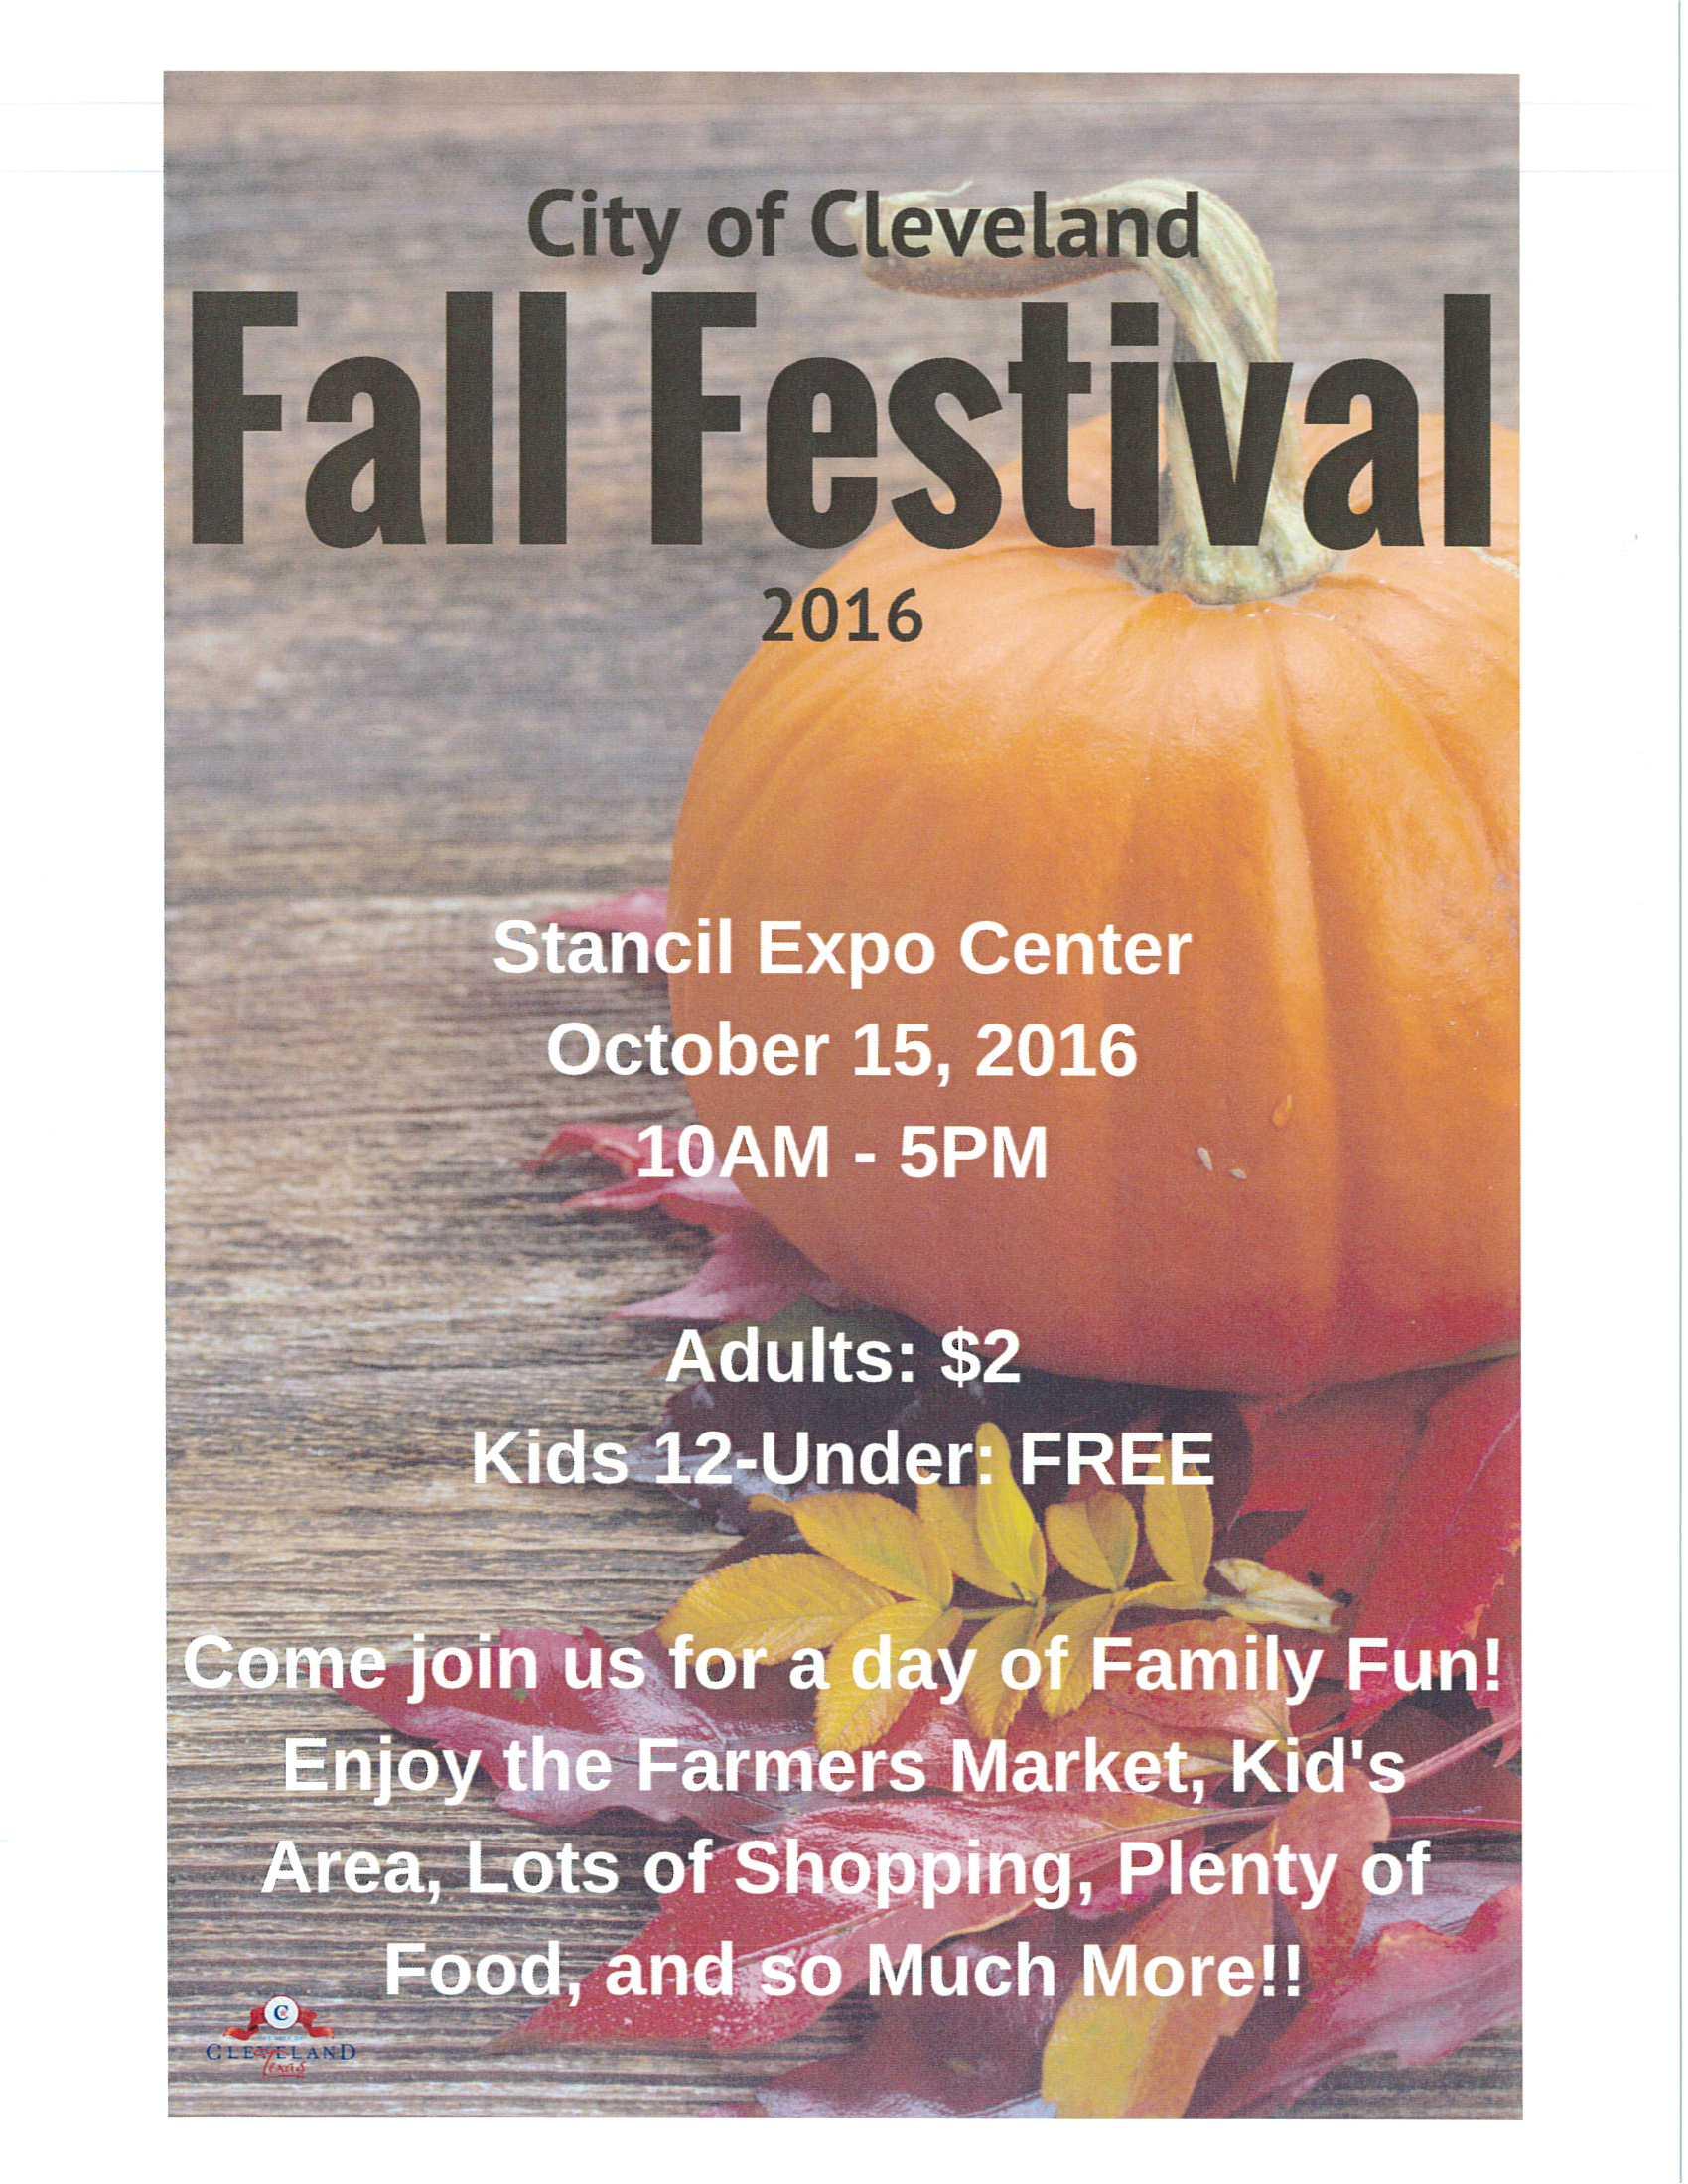 fall-festival-flyer_001